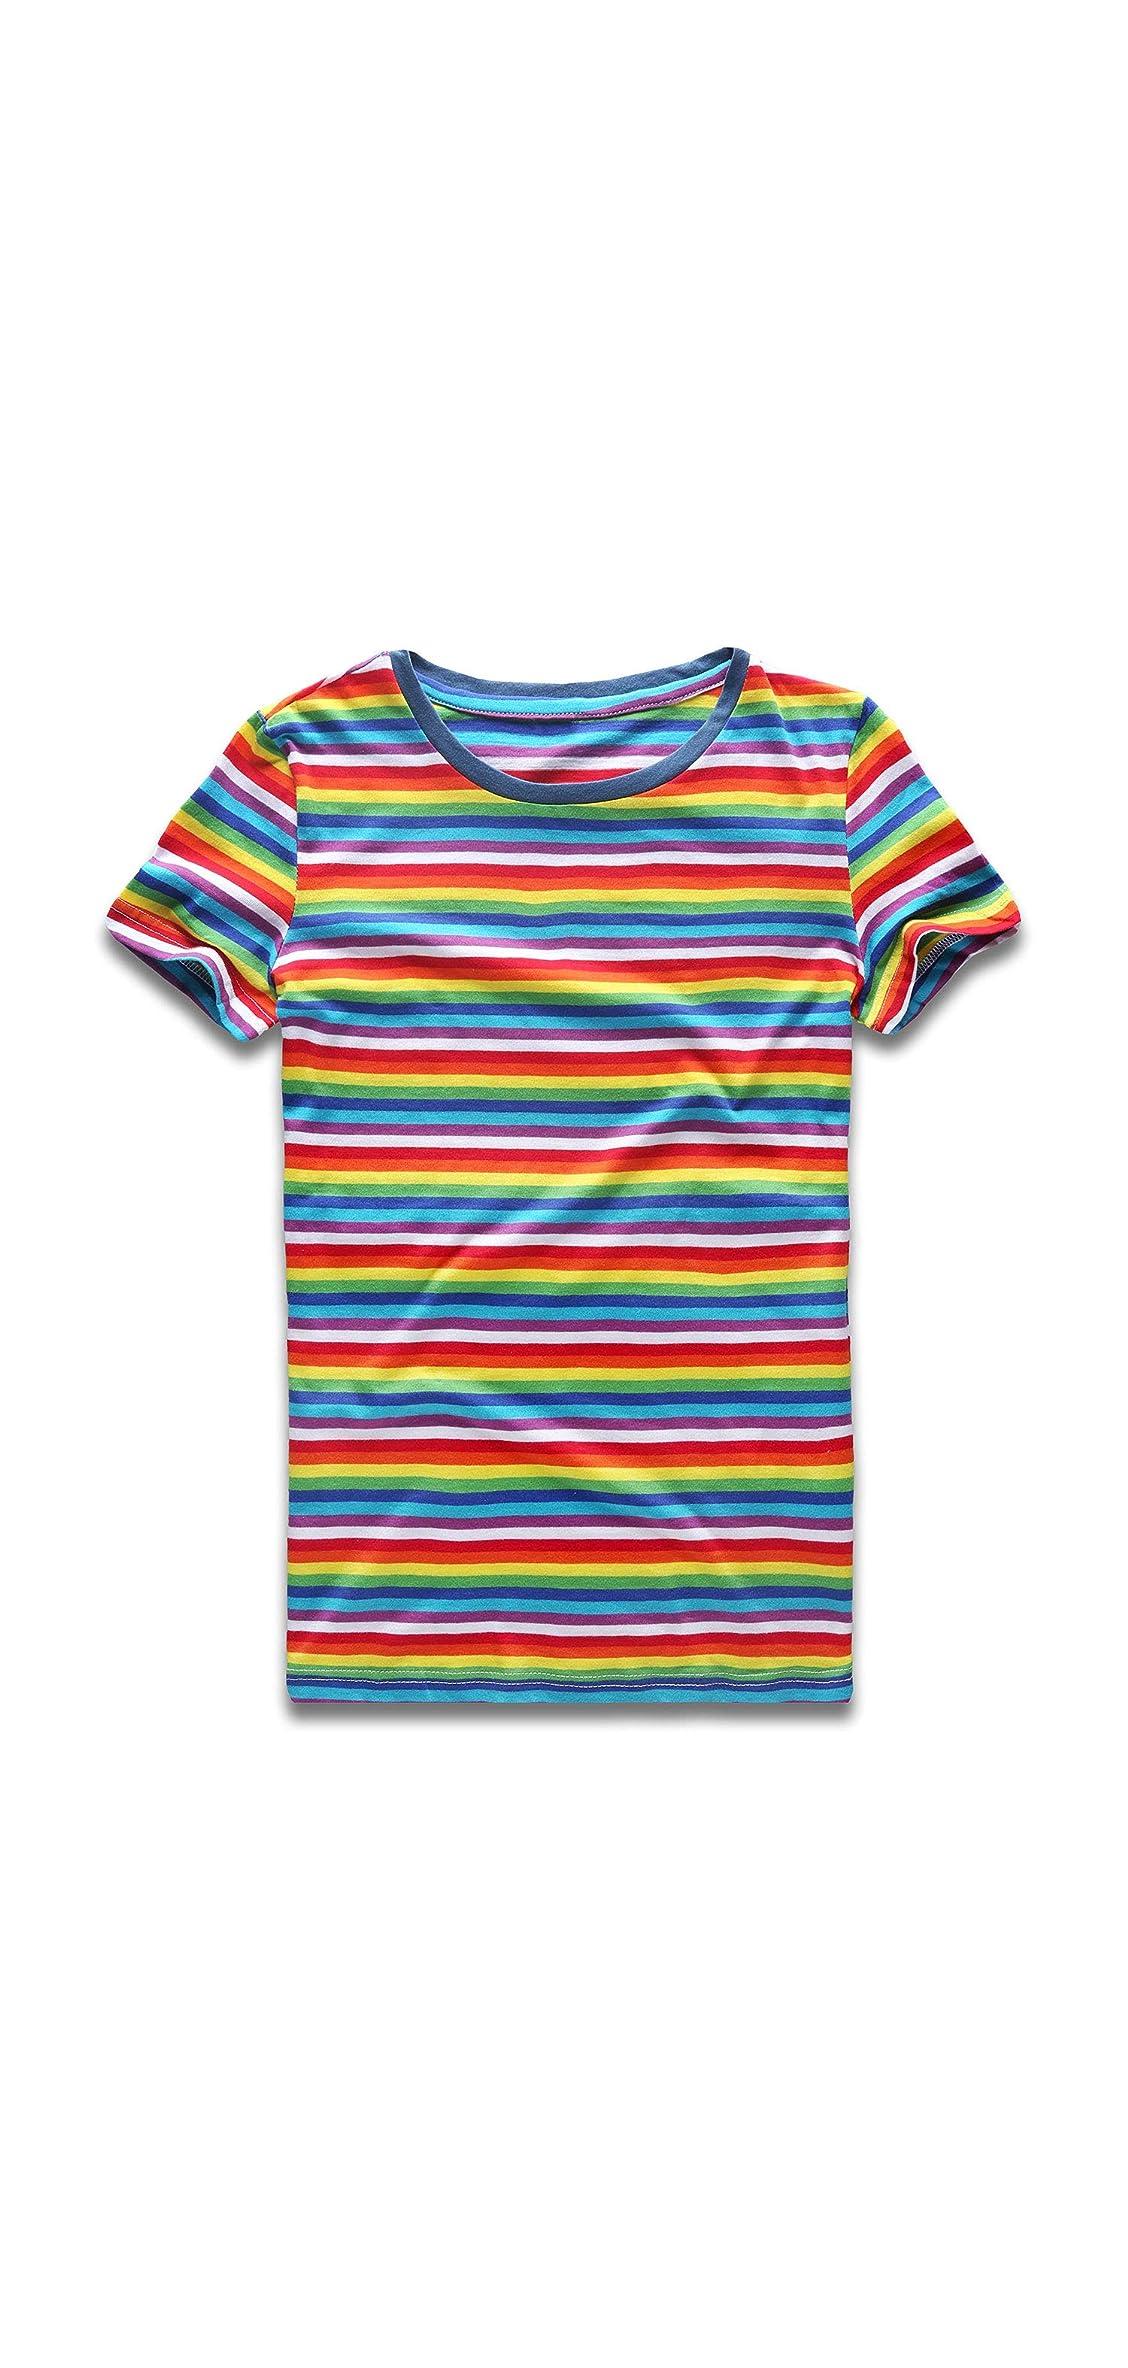 Rainbow T Shirt Women Striped Tee Crew Neck Short Sleeve Stripes